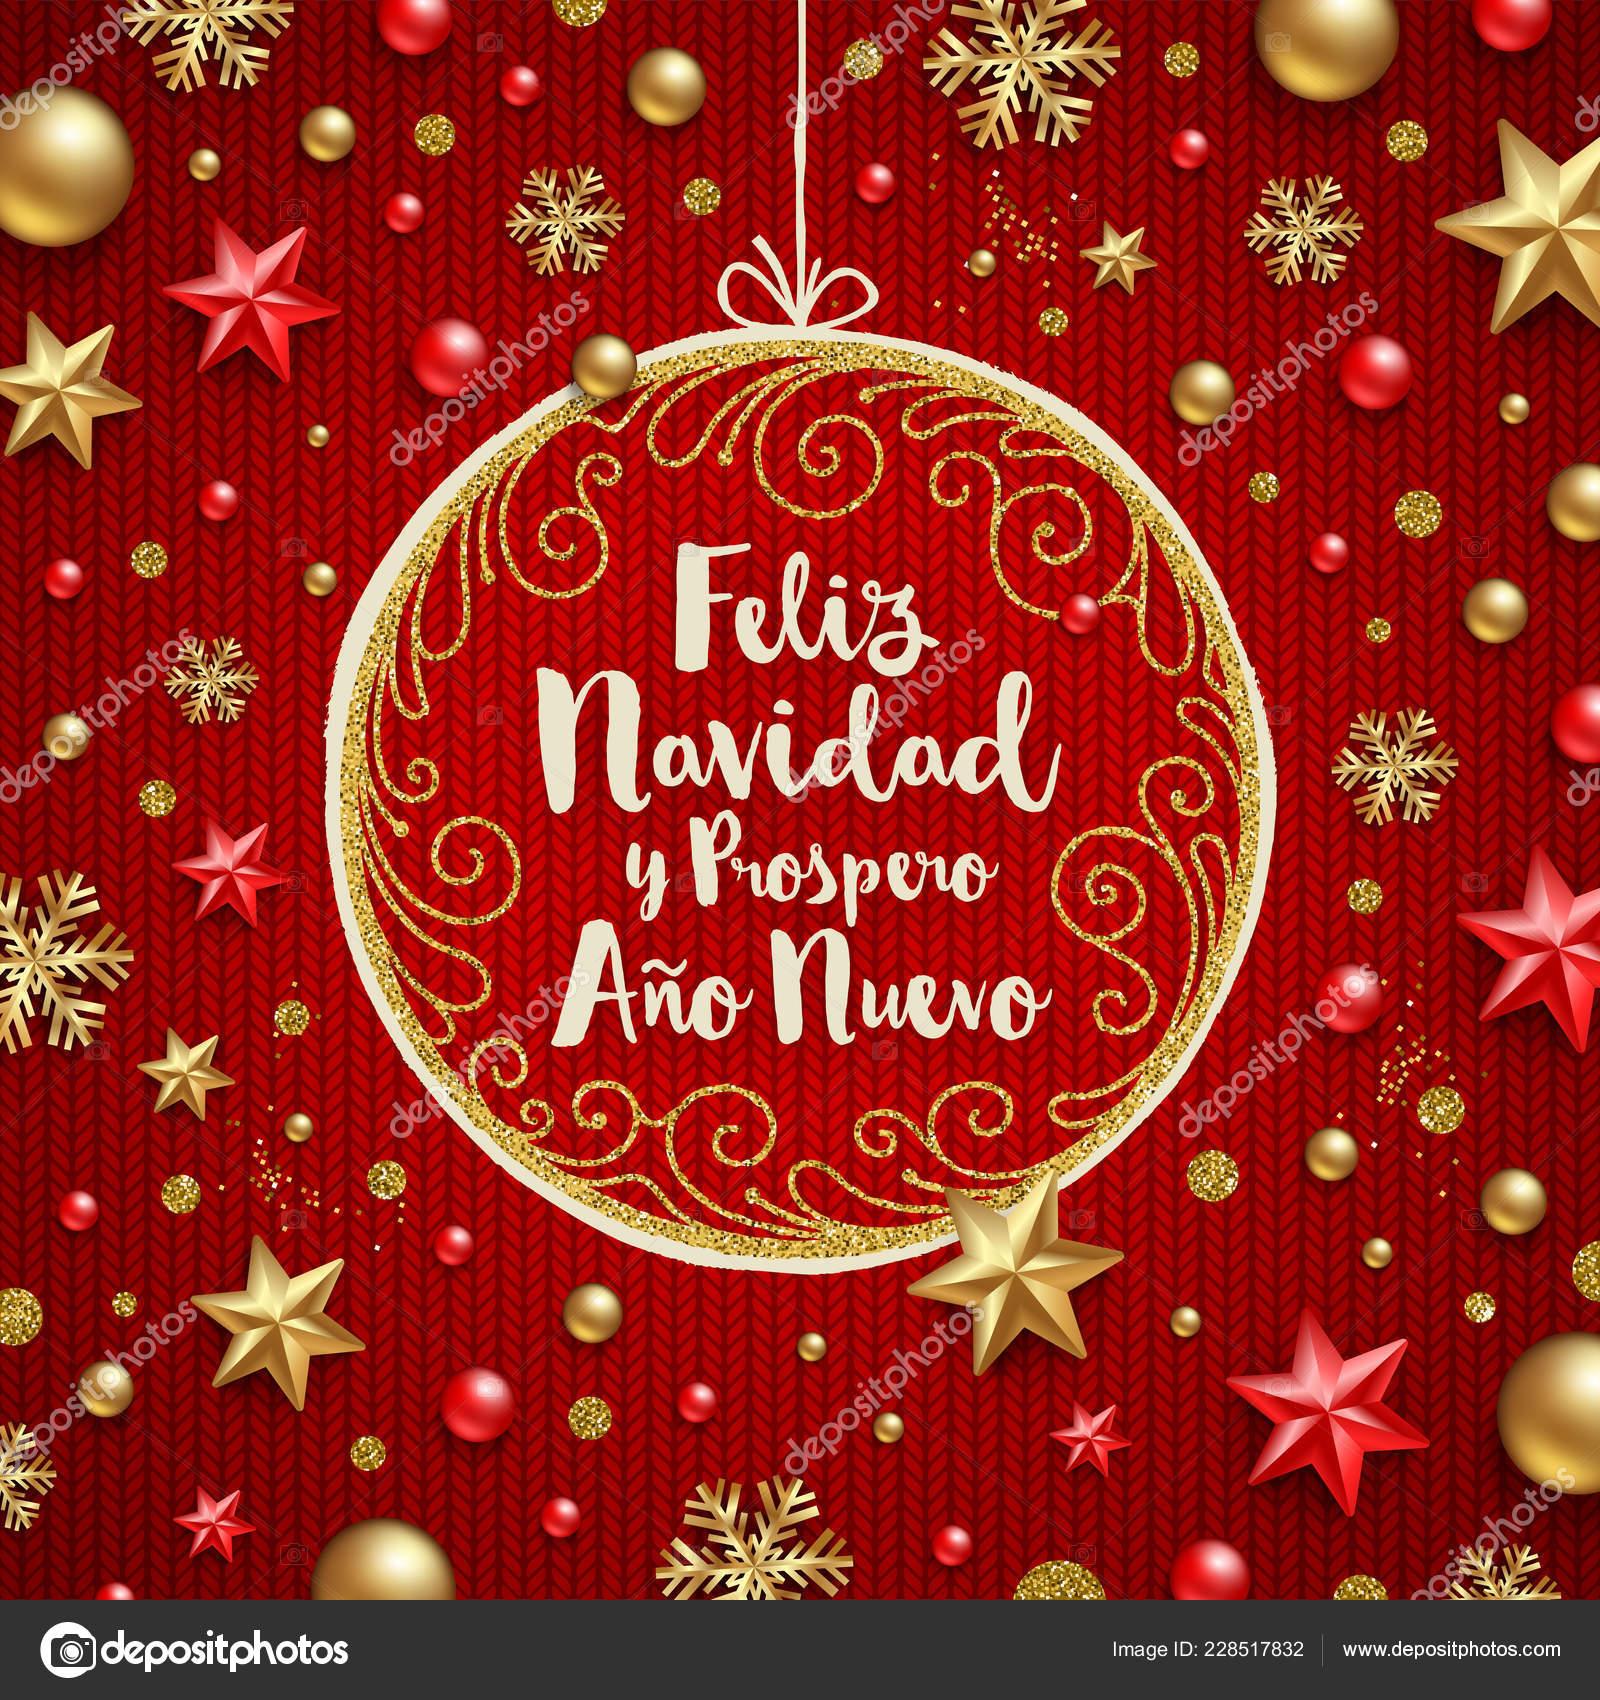 Christmas Wishes In Spanish.Feliz Navidad Christmas Greetings Spanish Holiday Greeting